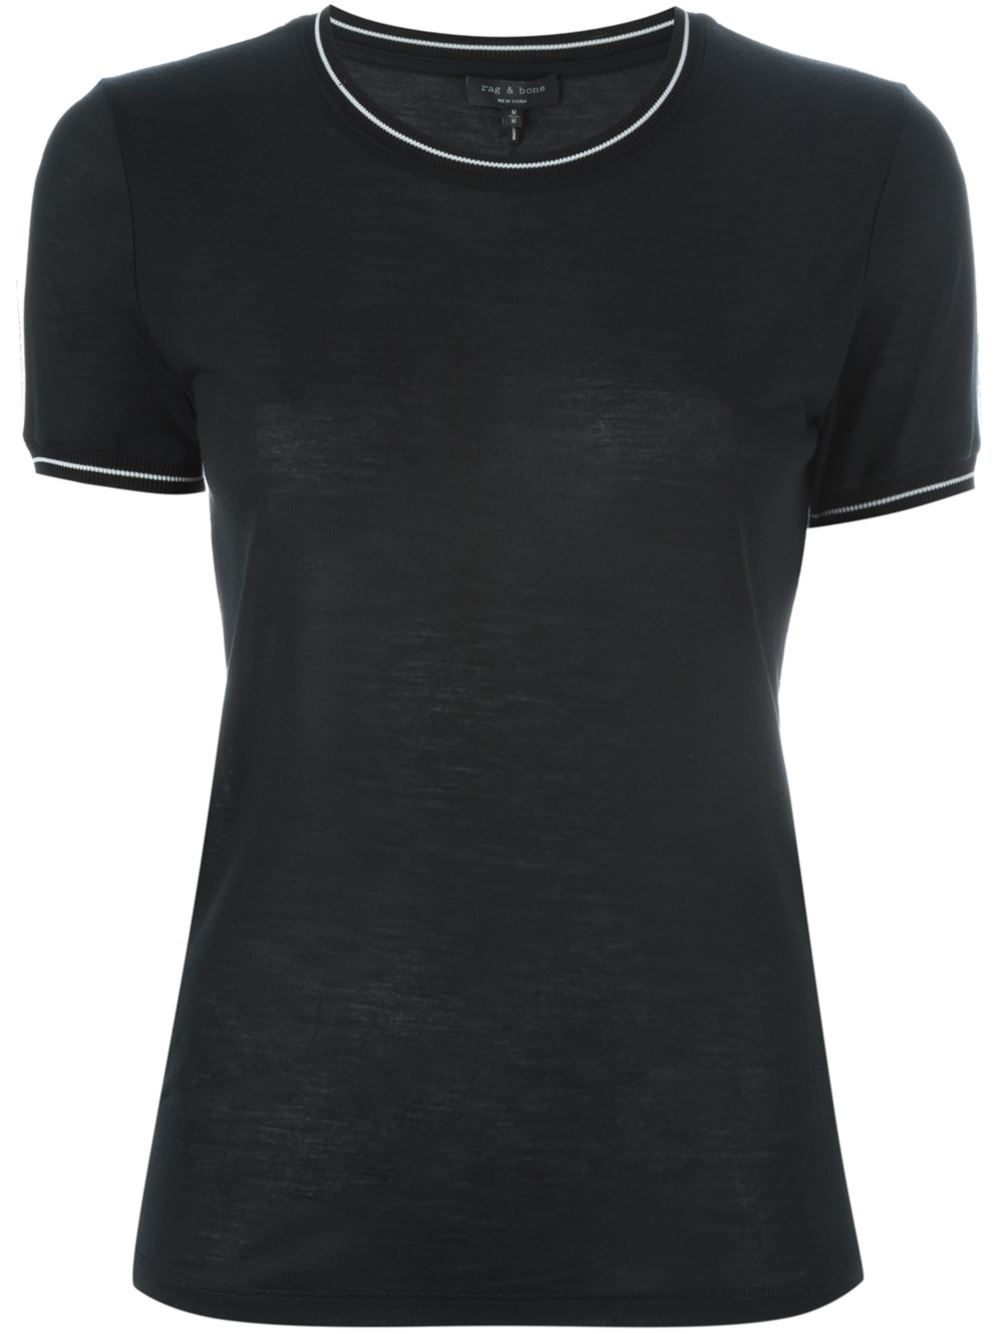 Rag bone contrast trim t shirt in black lyst for Rag bone shirt